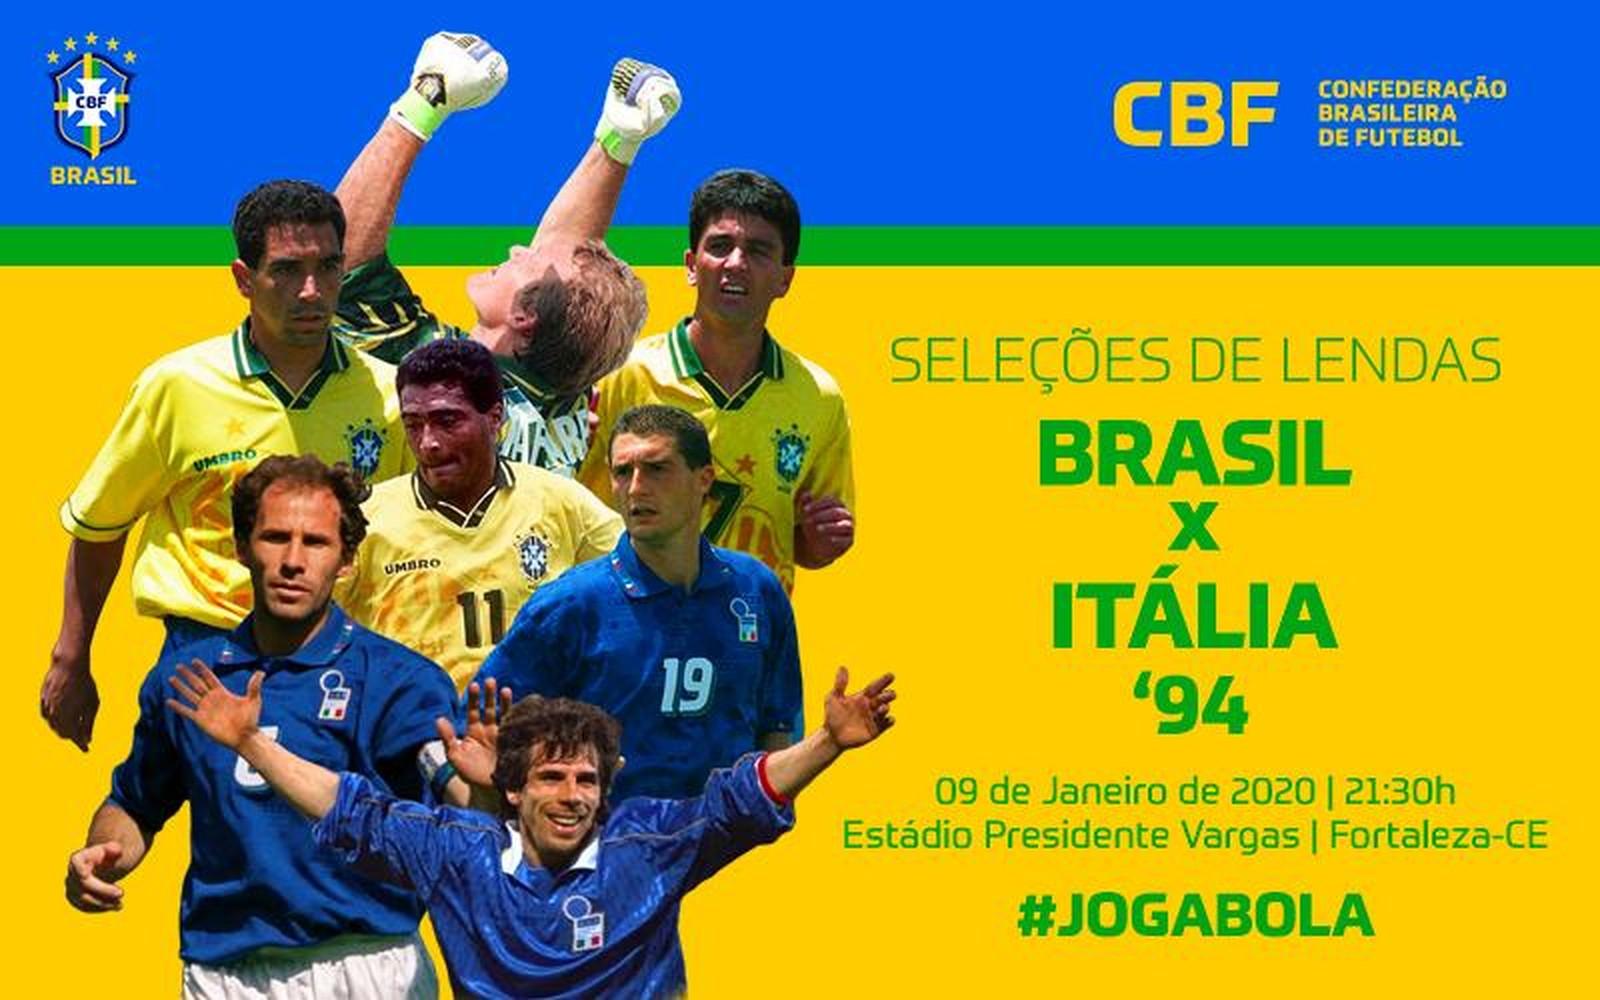 Brasil x Itália em Fortaleza — Foto: Reprodução/CBF